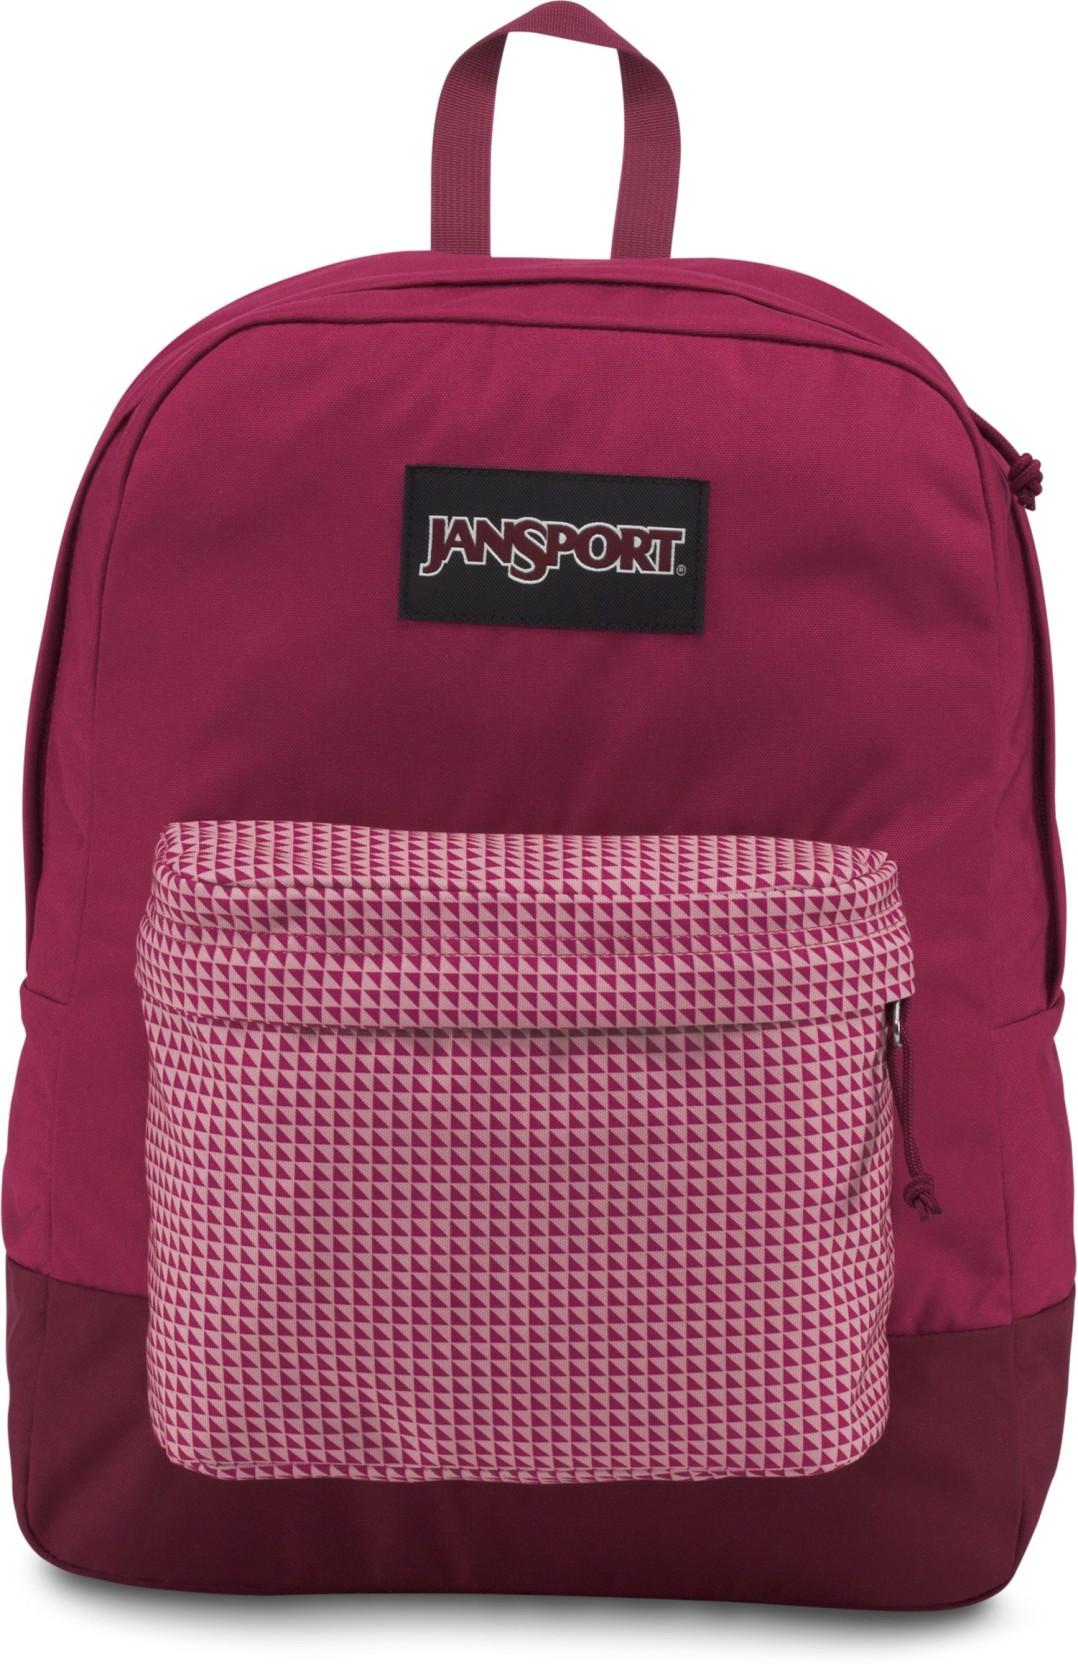 Jansport Black Label Neon Superbreak Backpack- Fenix Toulouse Handball dcba96002bf61